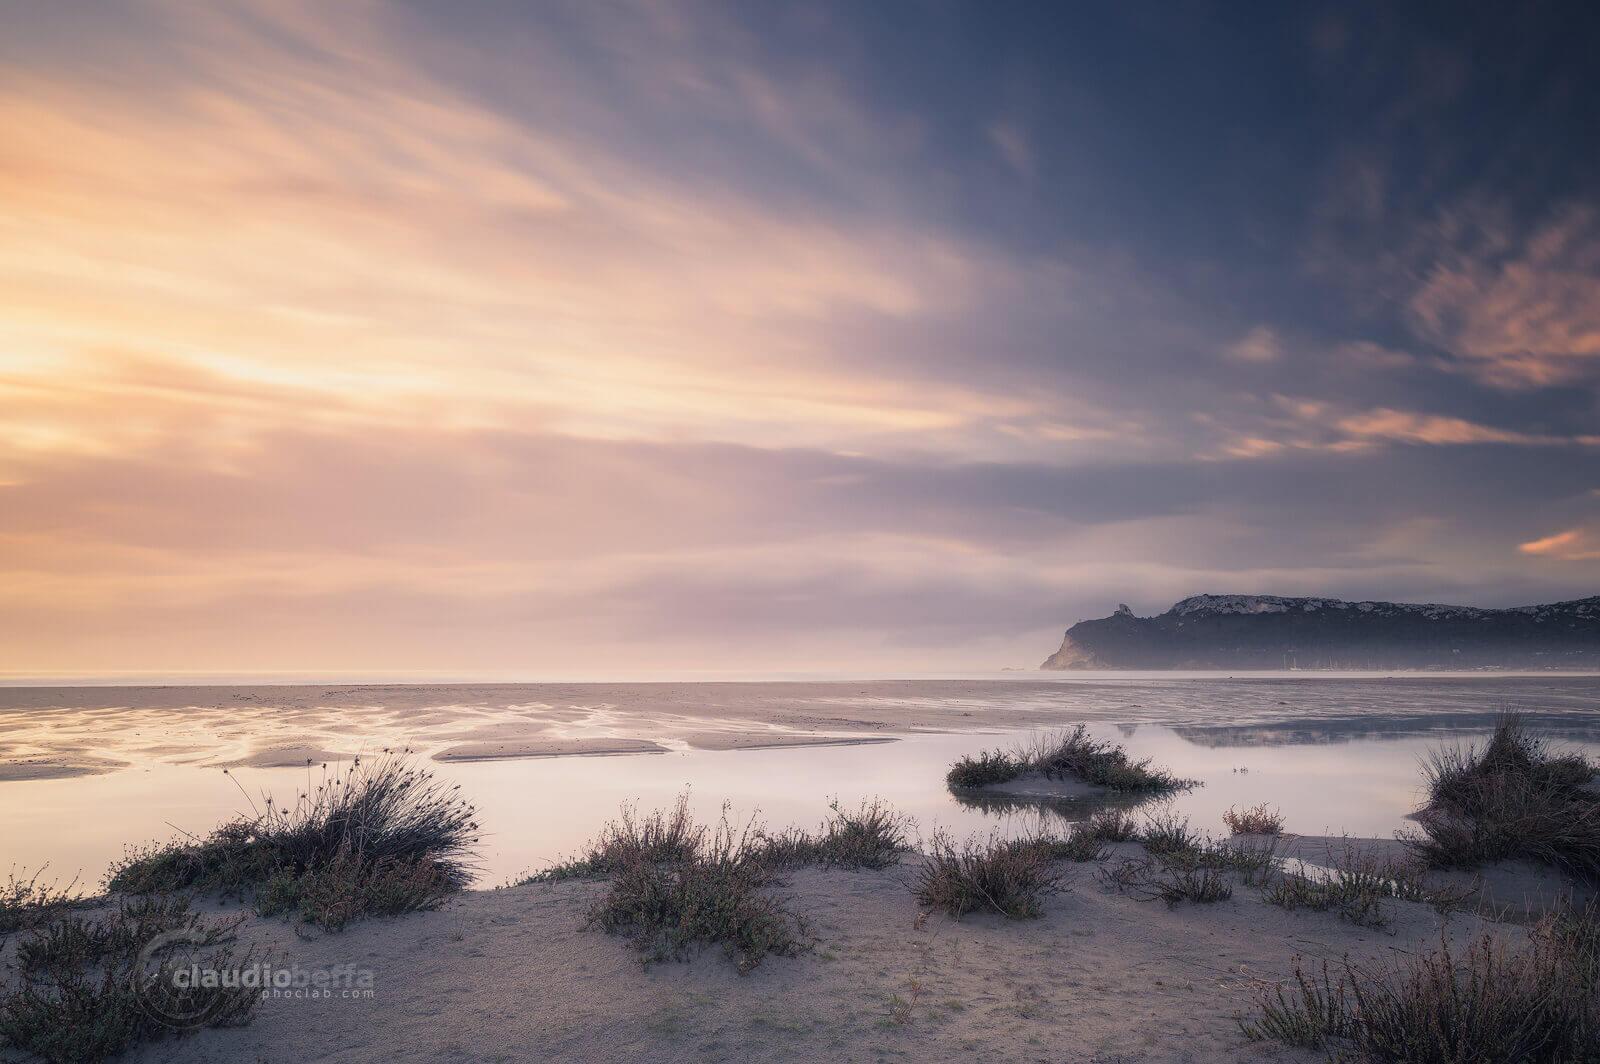 Sunrise on the flooded beach, Cagliari, Poetto, Sardinia, Italy, Landscape, Seascape, Long exposure, Sunrise, Beach, Sky, Clouds